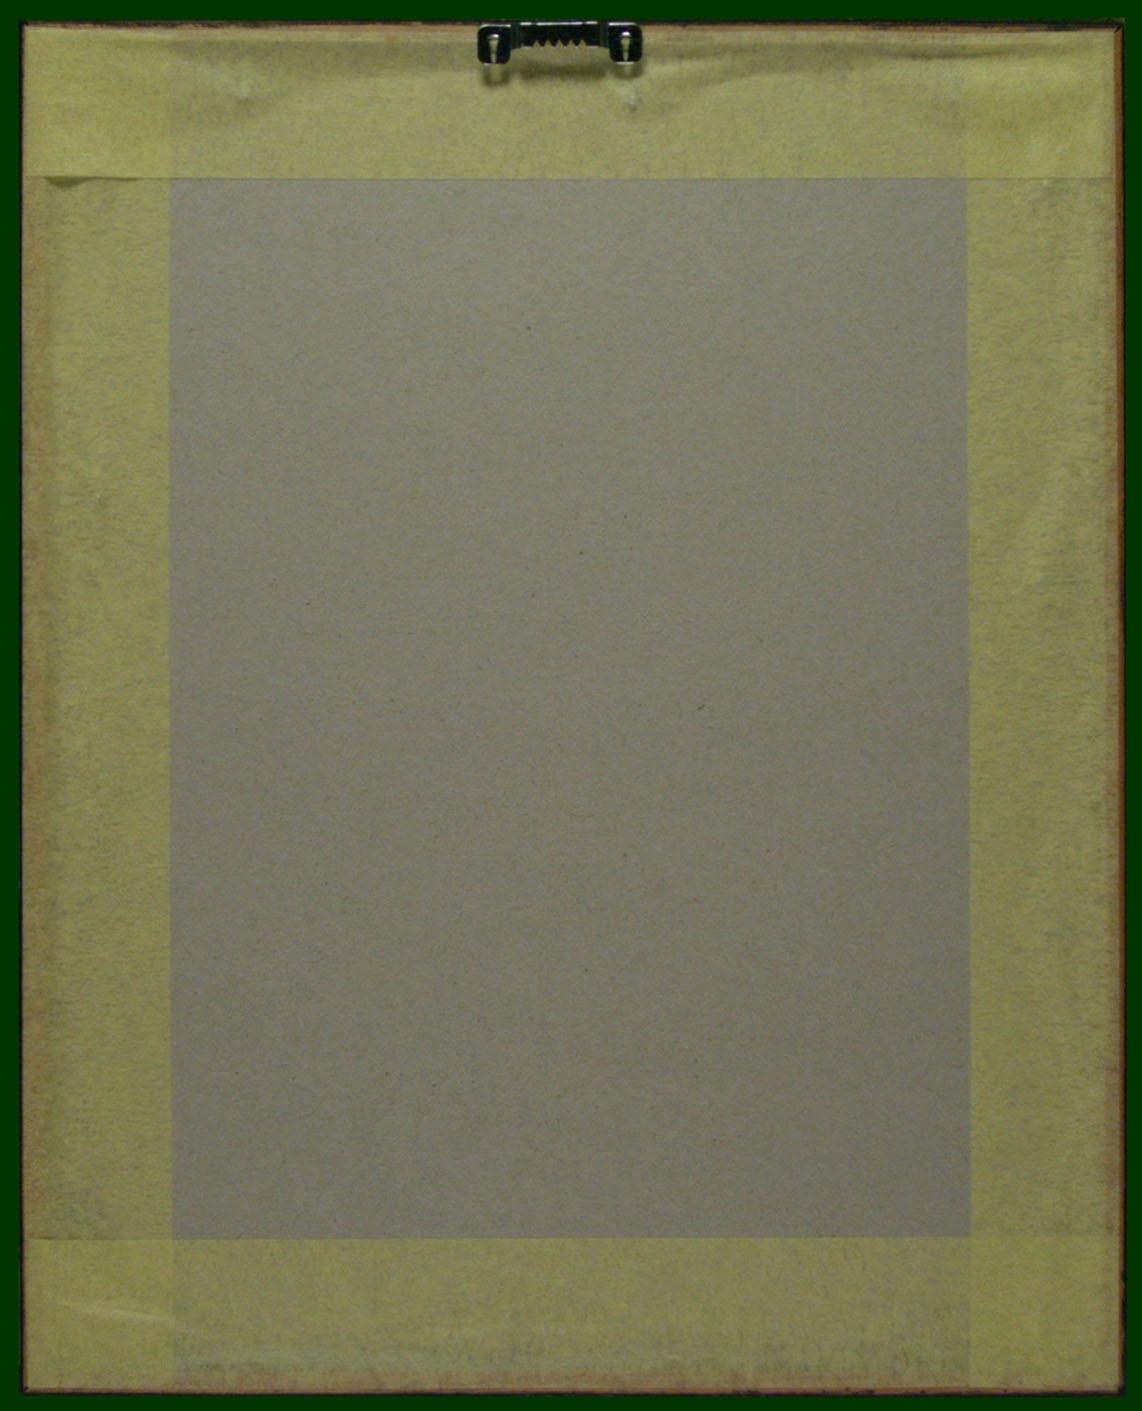 095-015h.JPG (1142×1411)